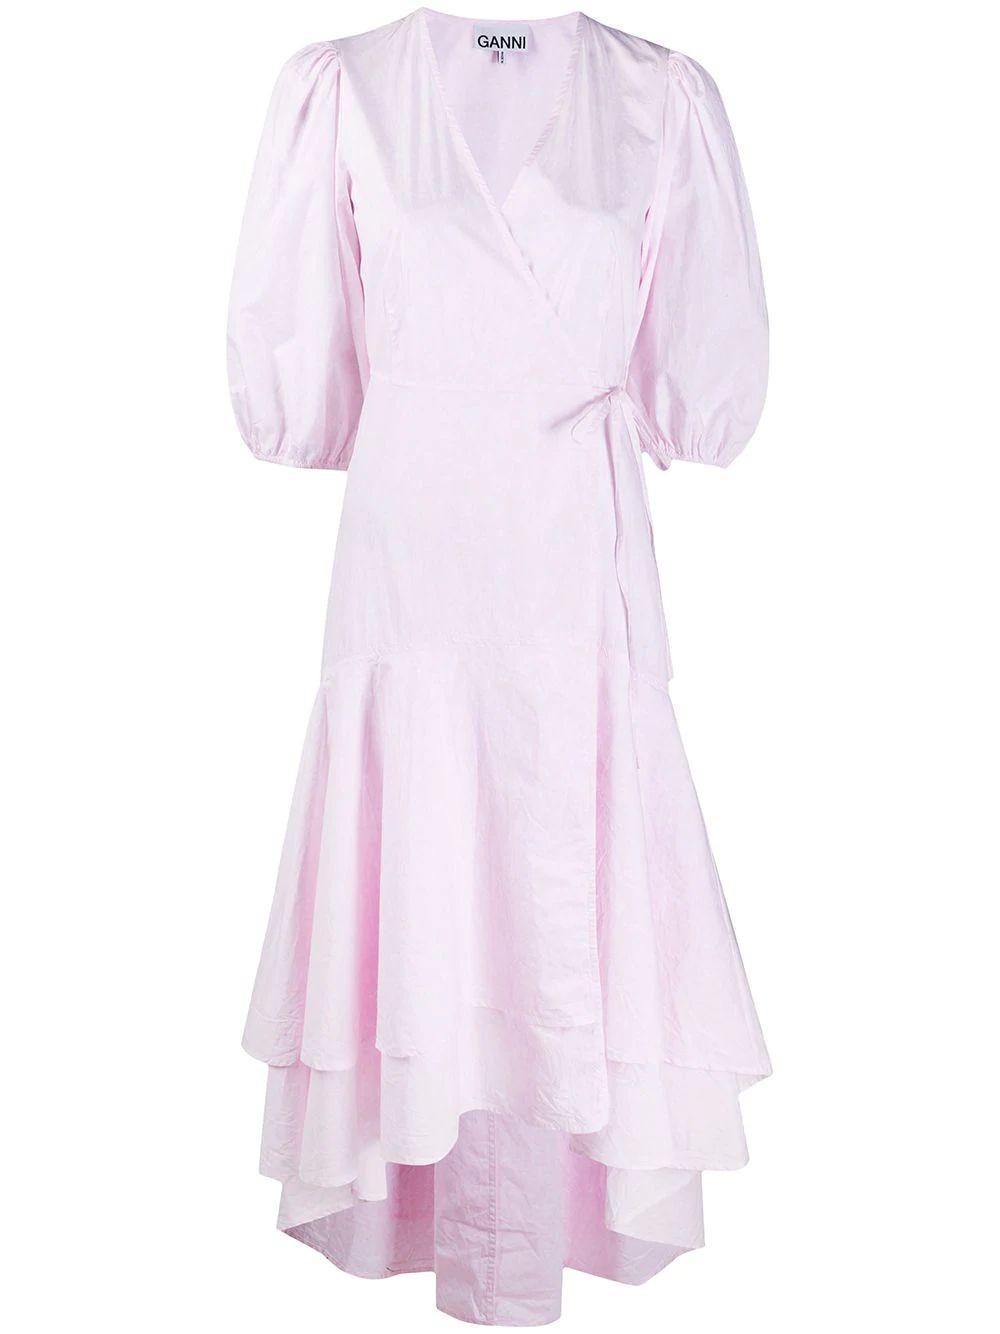 Cotton Poplin Balloon Sleeve Dress Item # F4978